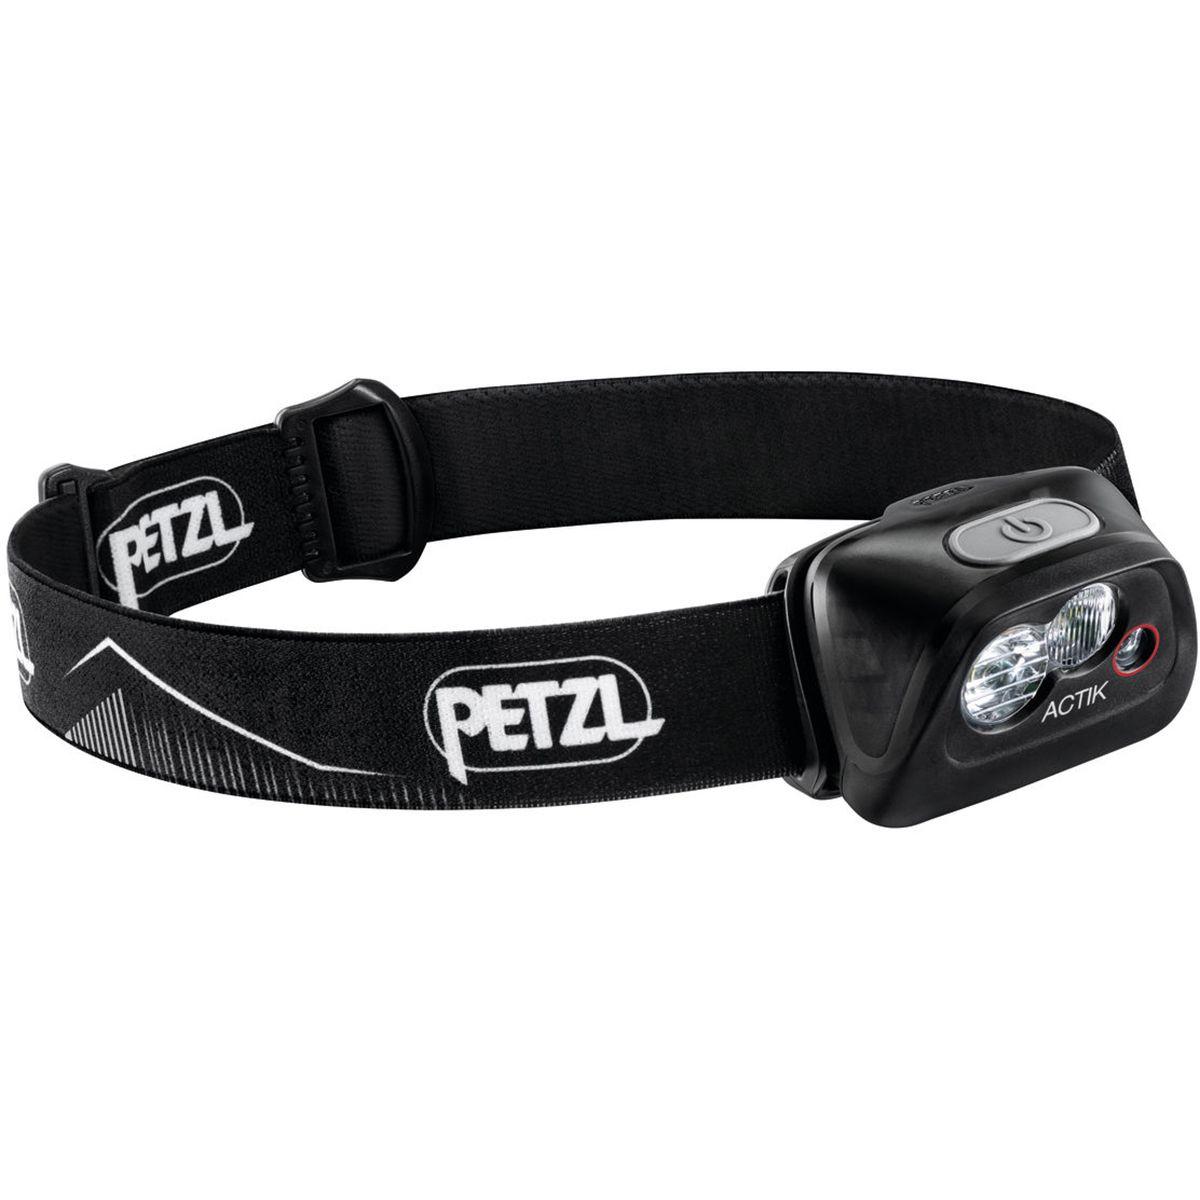 Snowshoe to Artist Point - Gear Guide - Petzl Headlamp